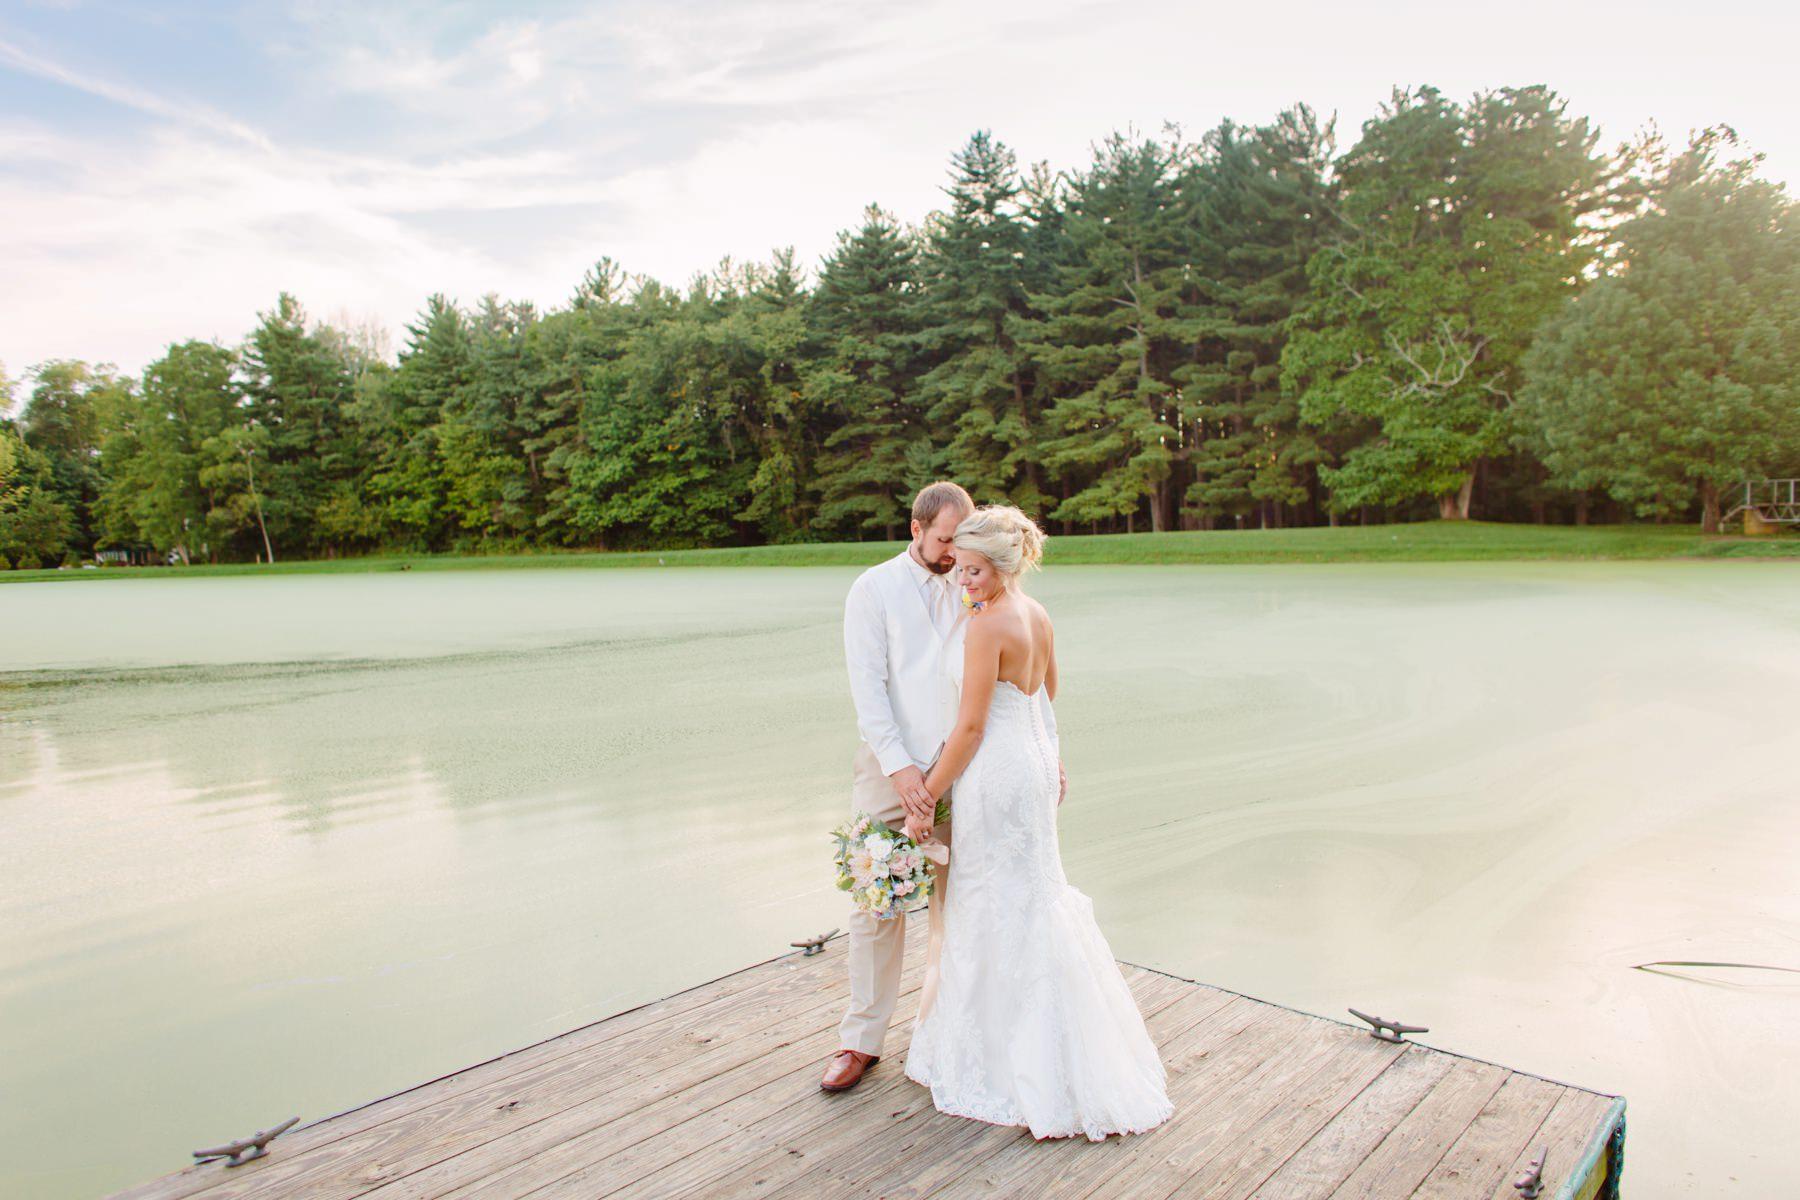 Tire Swing Photography | Timeless Charm Wedding | Camden, Ohio 35